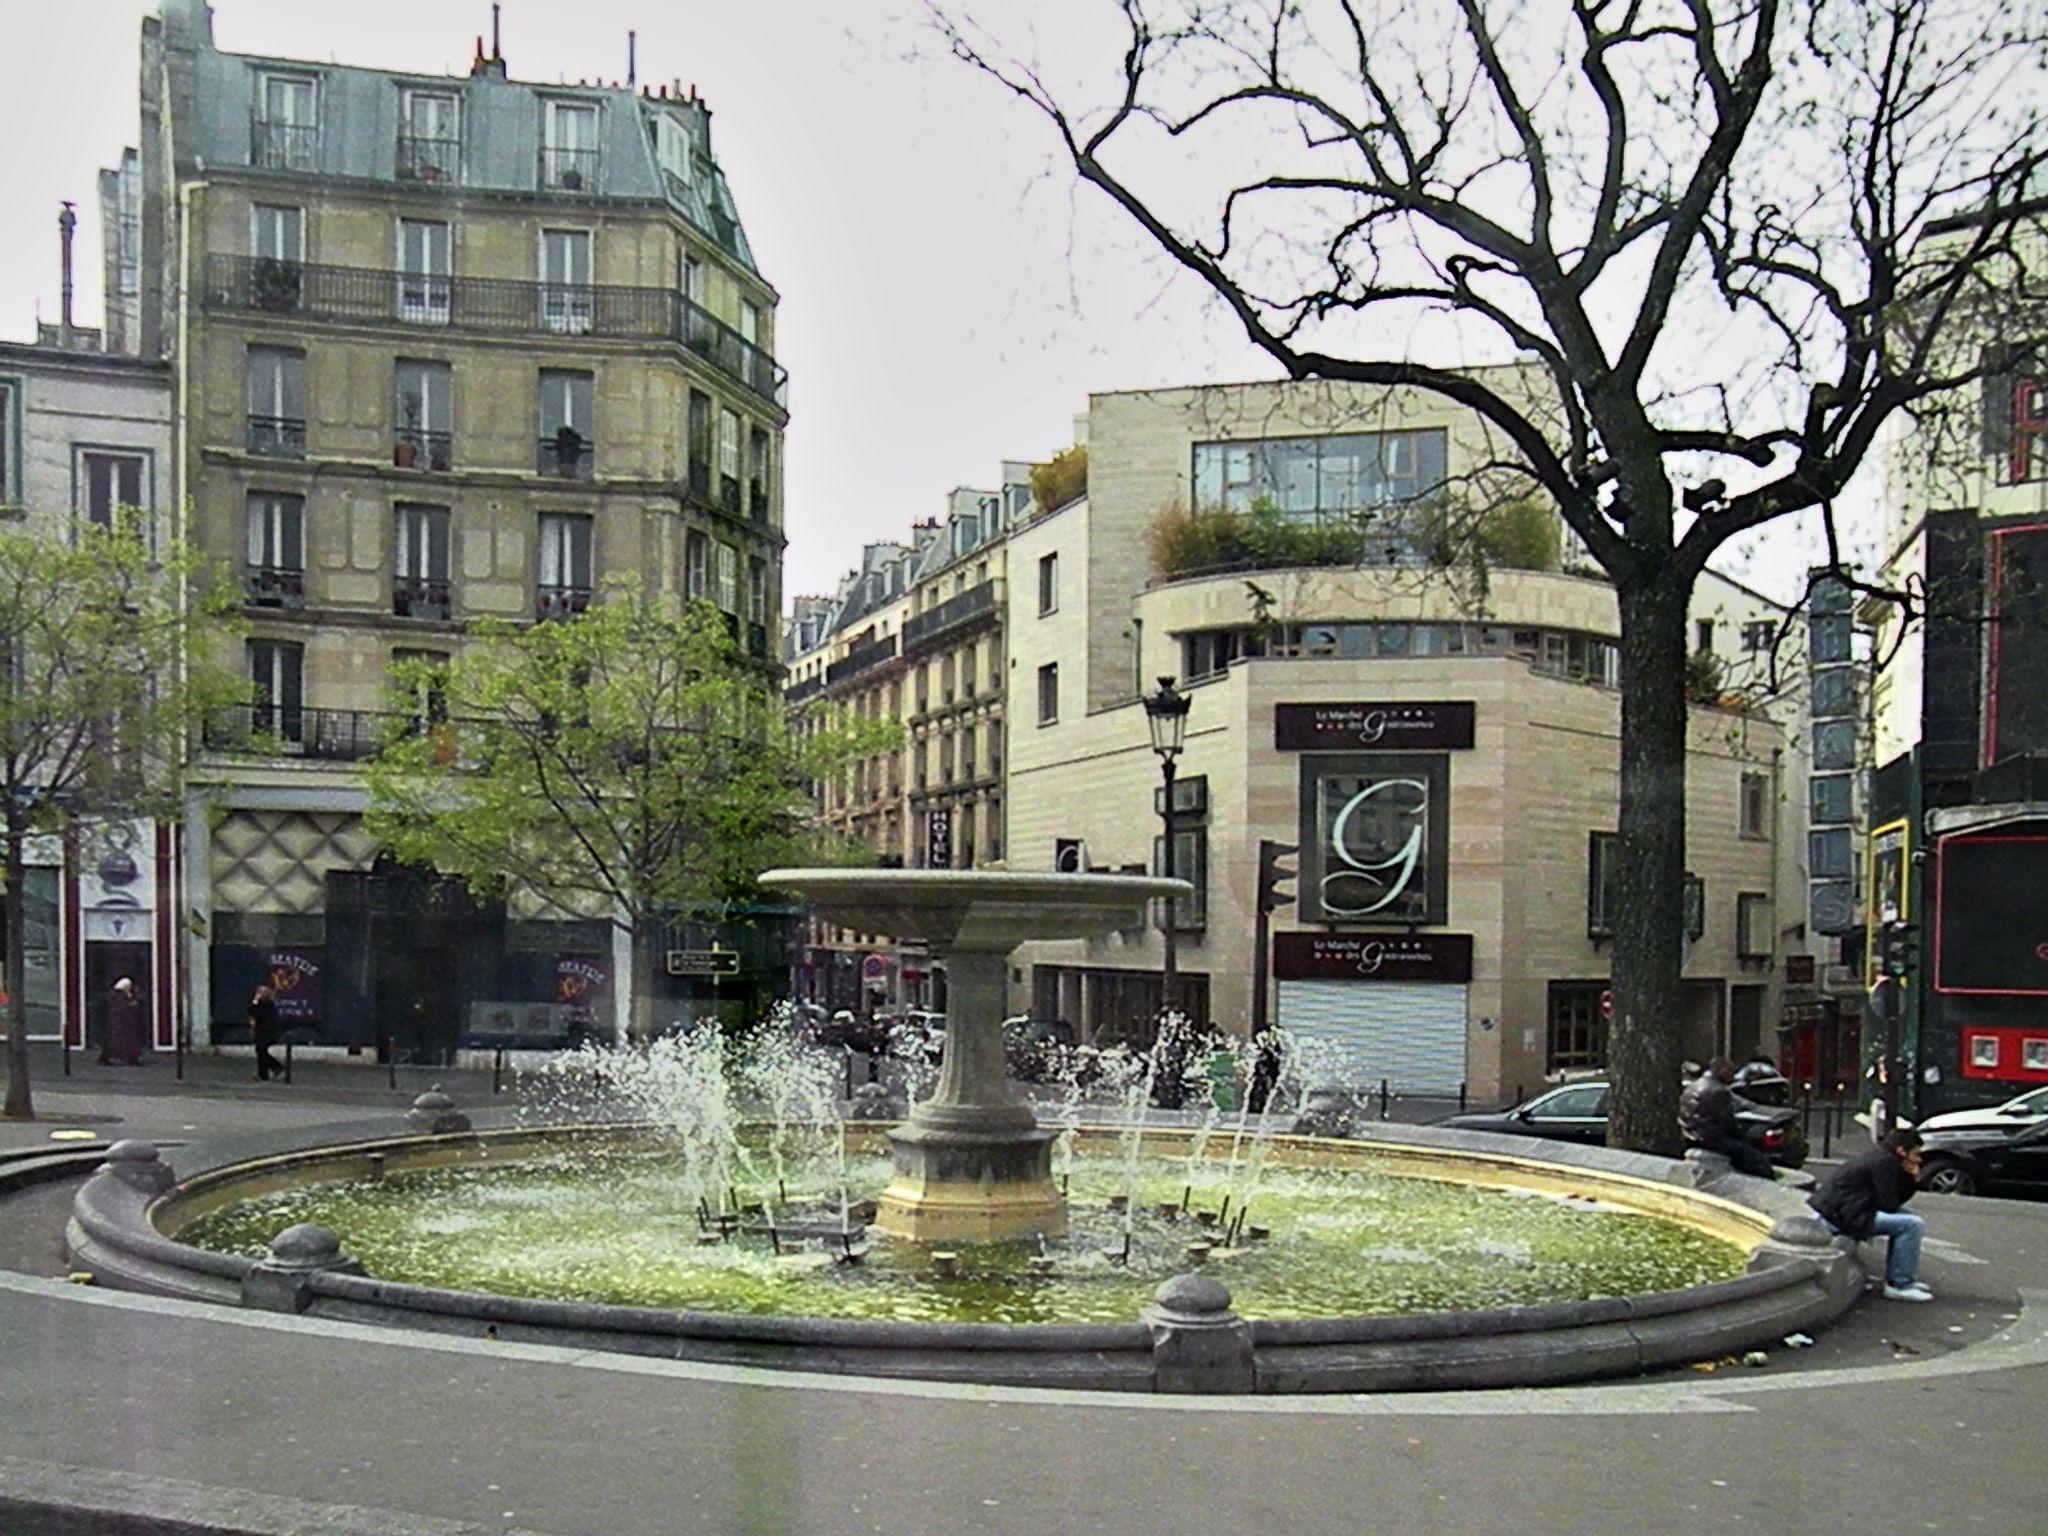 Vista de la Place Pigalle de París, en 2009. Crédito: Wikimedia. Vitold Muratov.